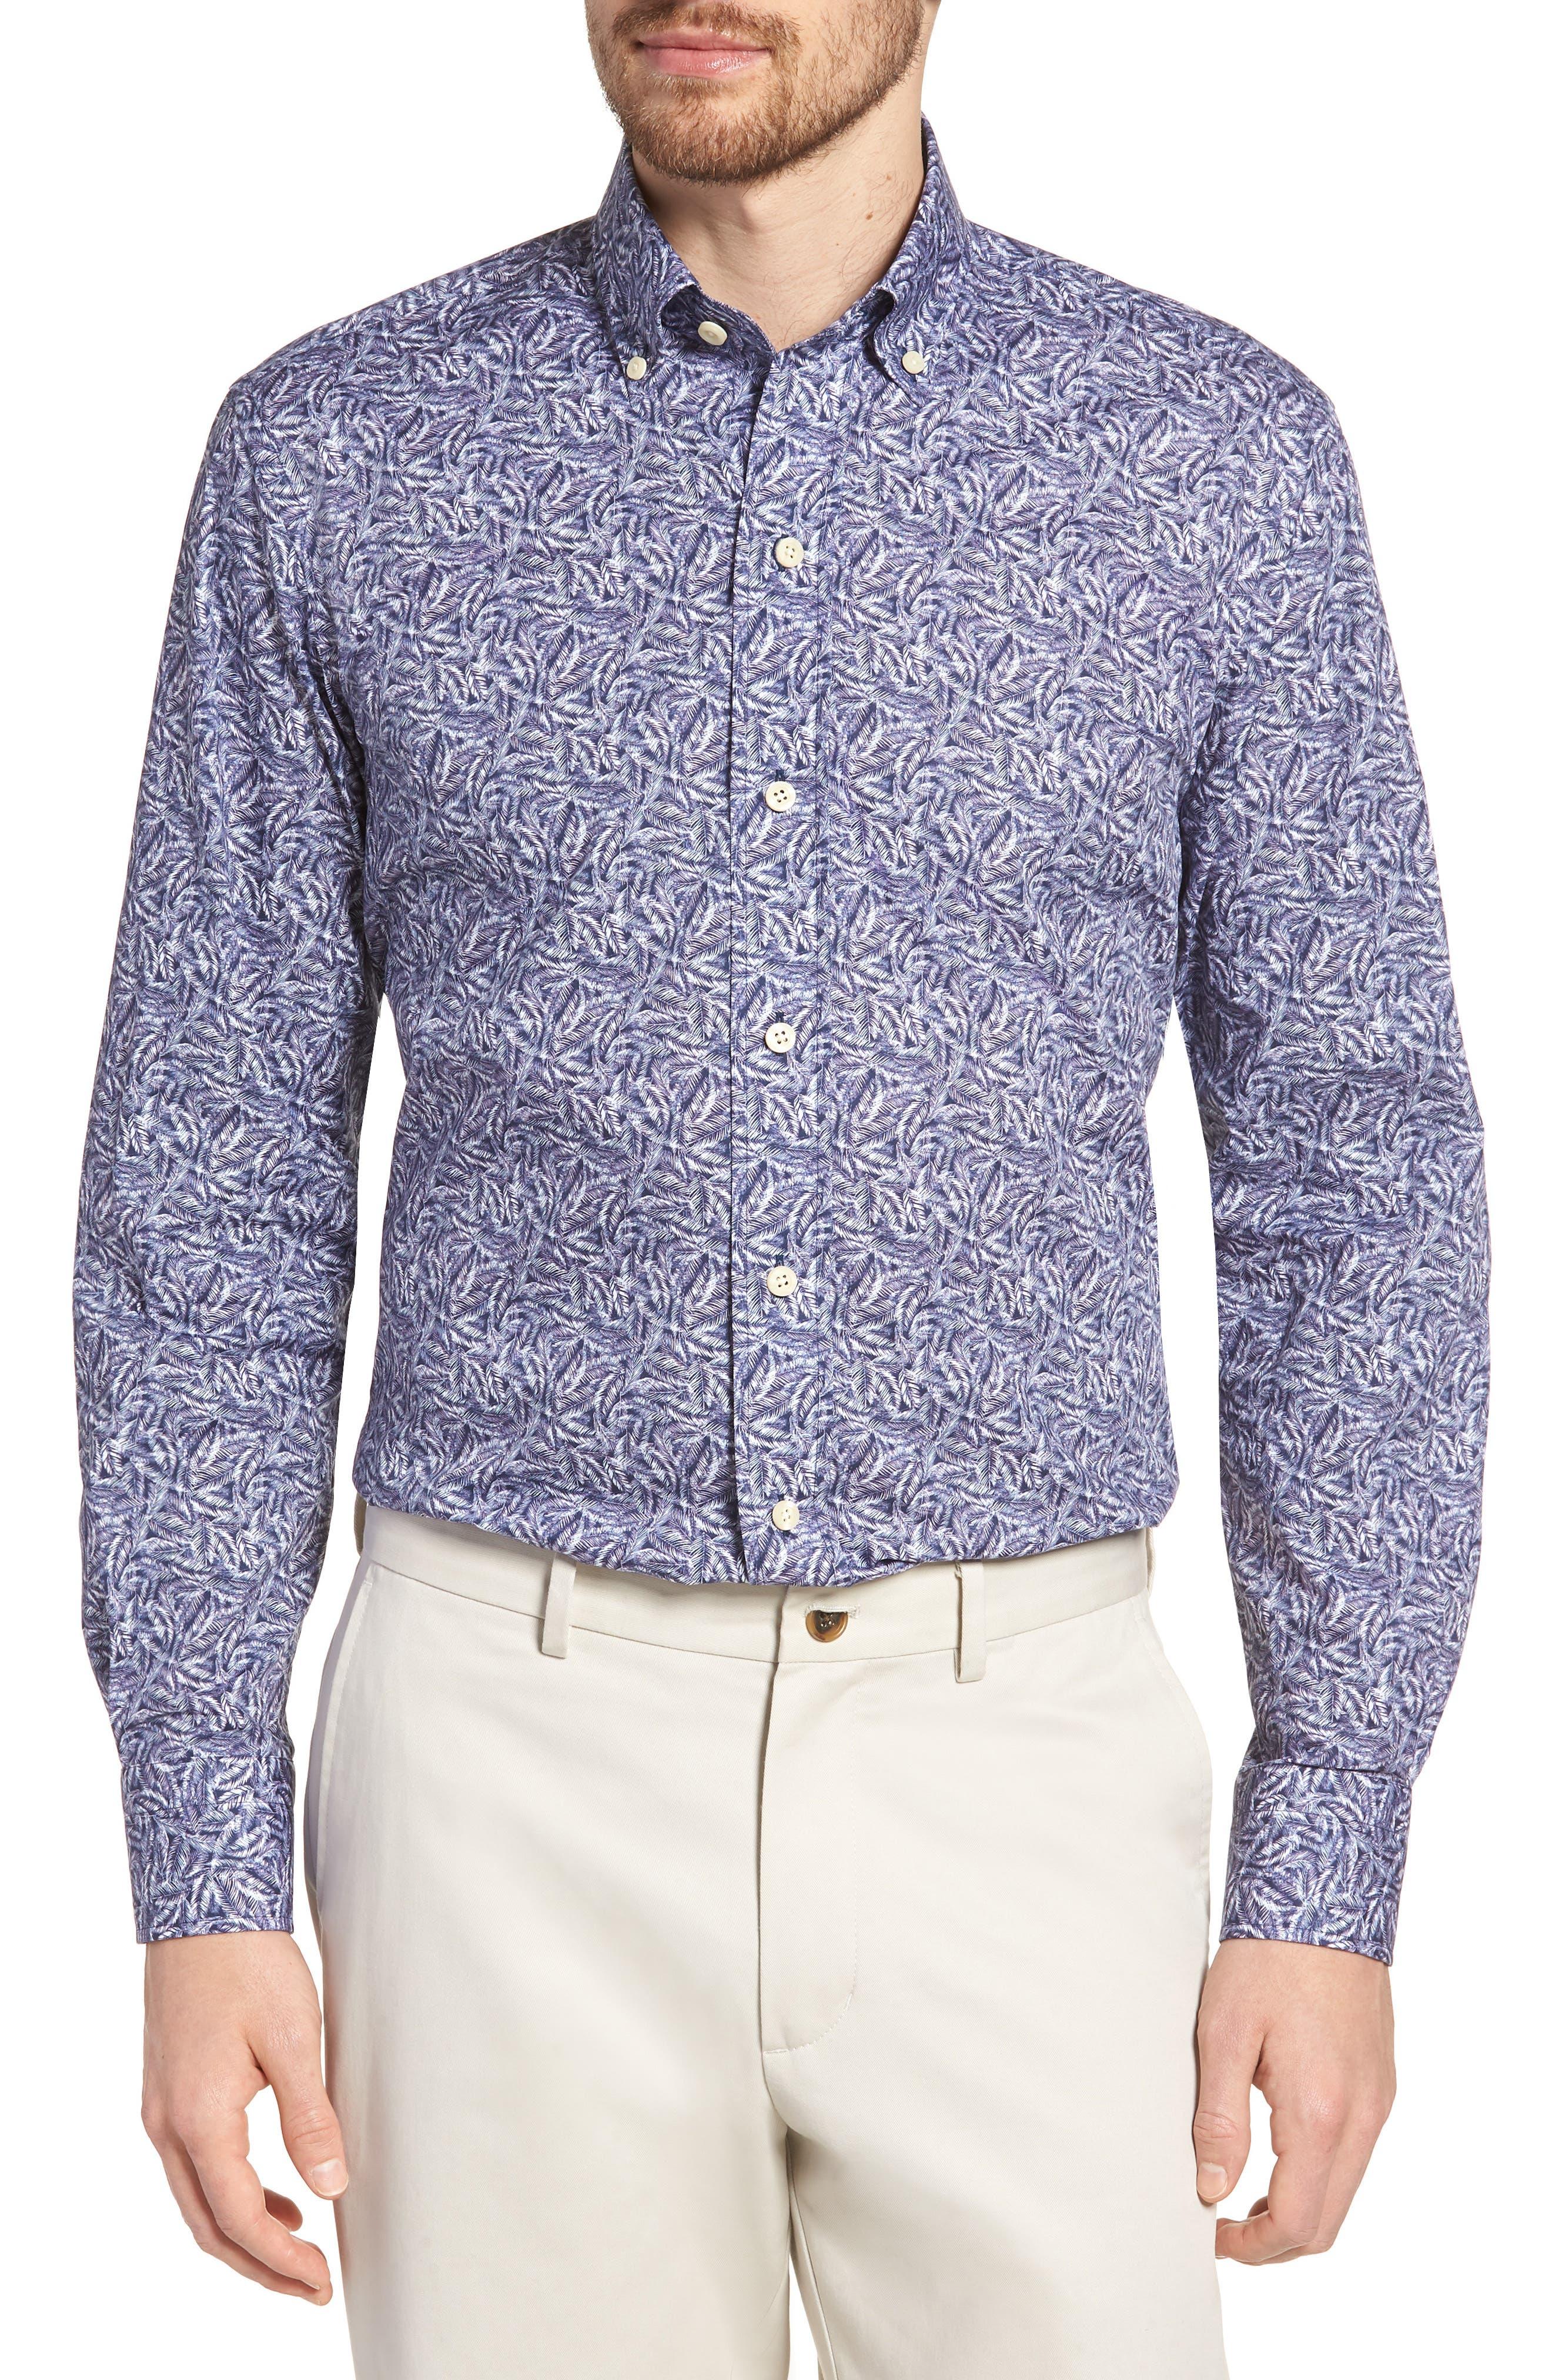 Garnaby Slim Fit Print Dress Shirt,                             Main thumbnail 1, color,                             400